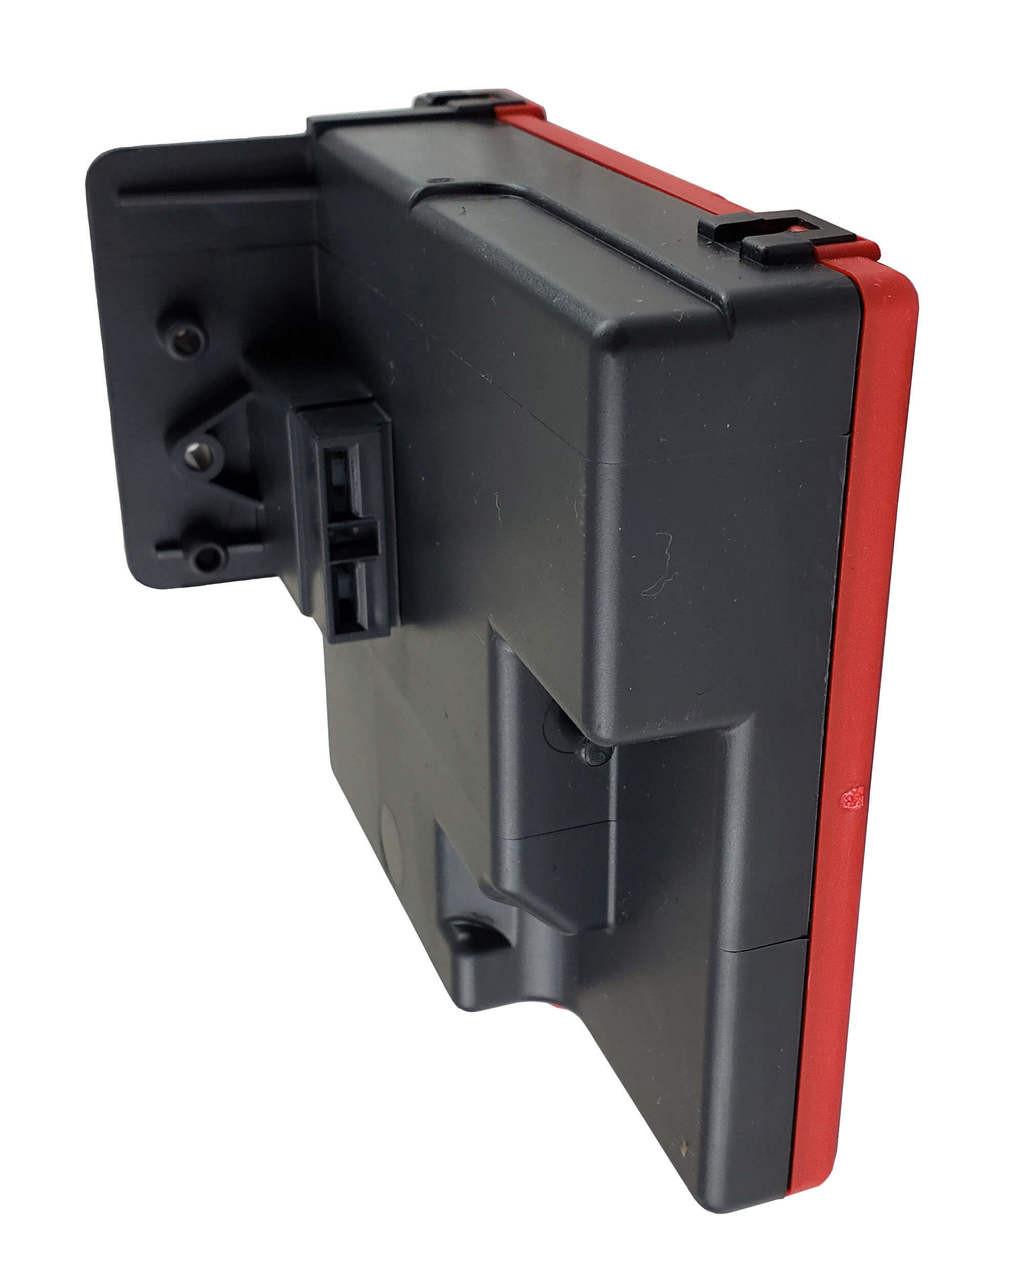 Bromic PCB control port view